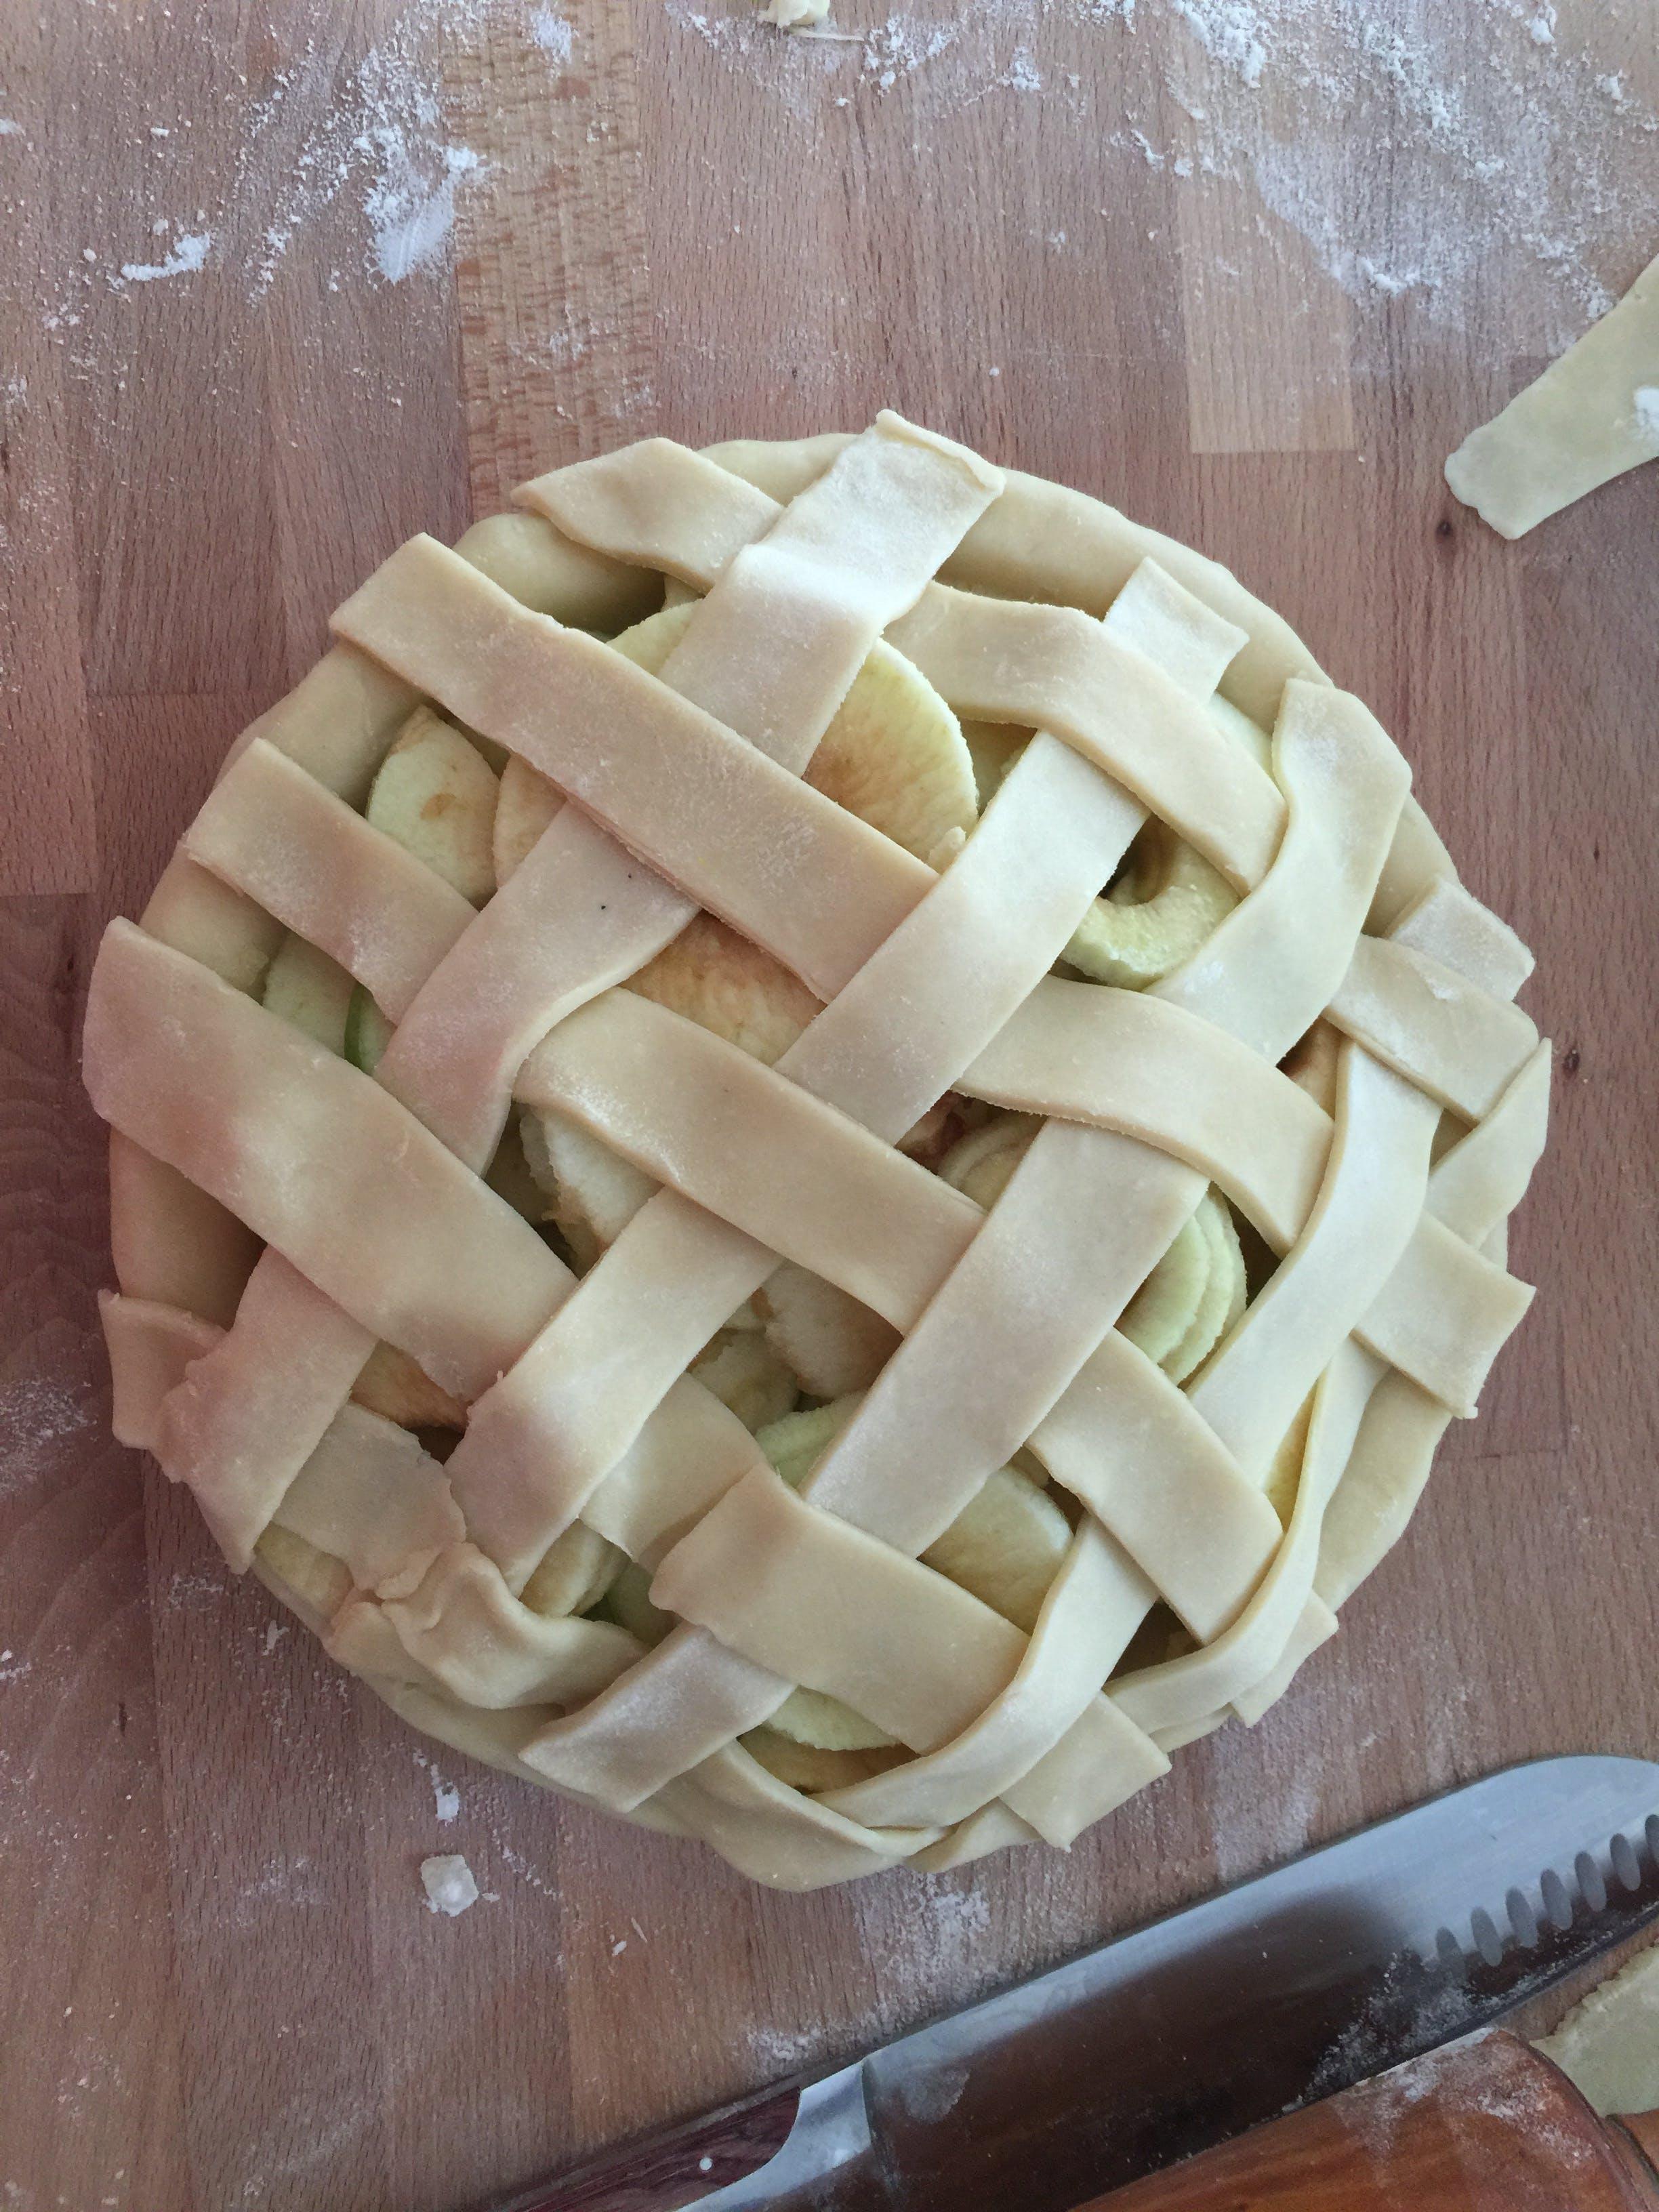 Free stock photo of apple pie, bakery, baking, crust